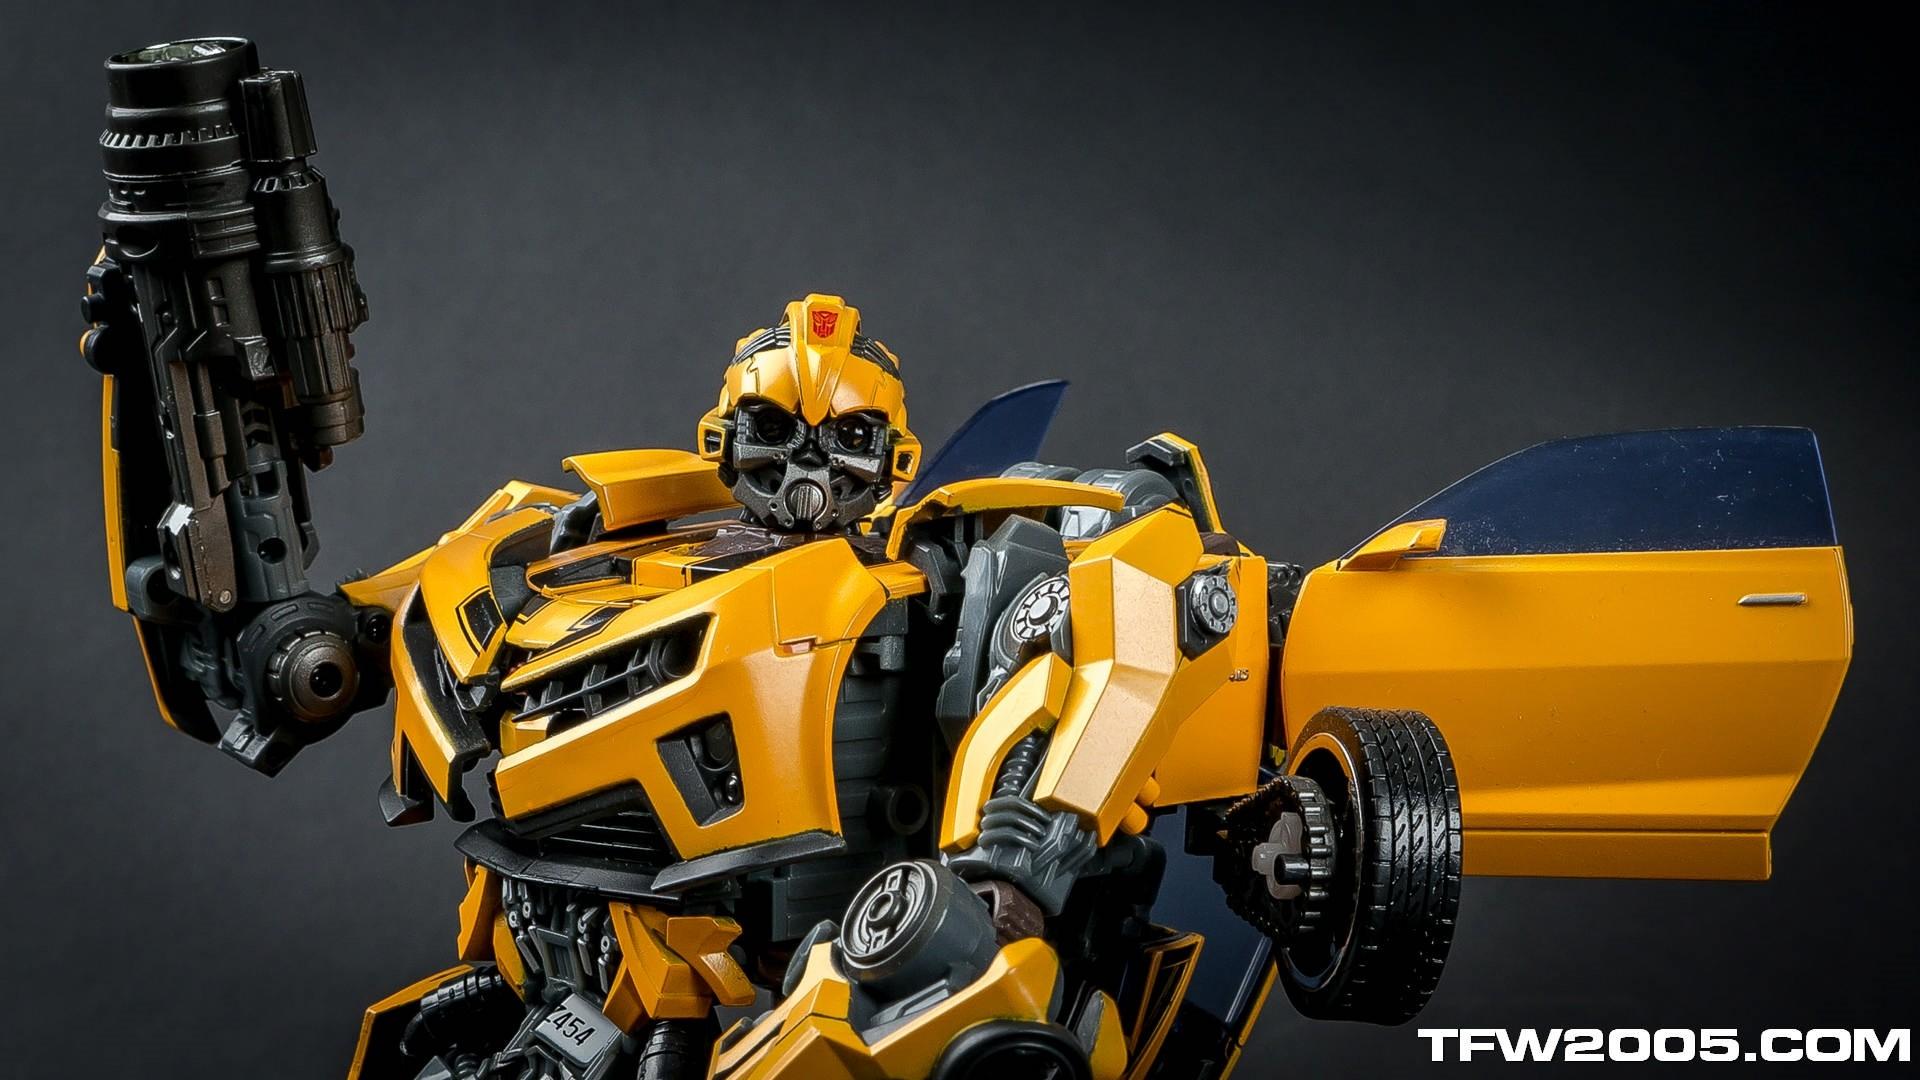 Transformers Wallpapers Best Wallpapers 1280×1024 Transformers Wallpaper  (42 Wallpapers) | Adorable Wallpapers